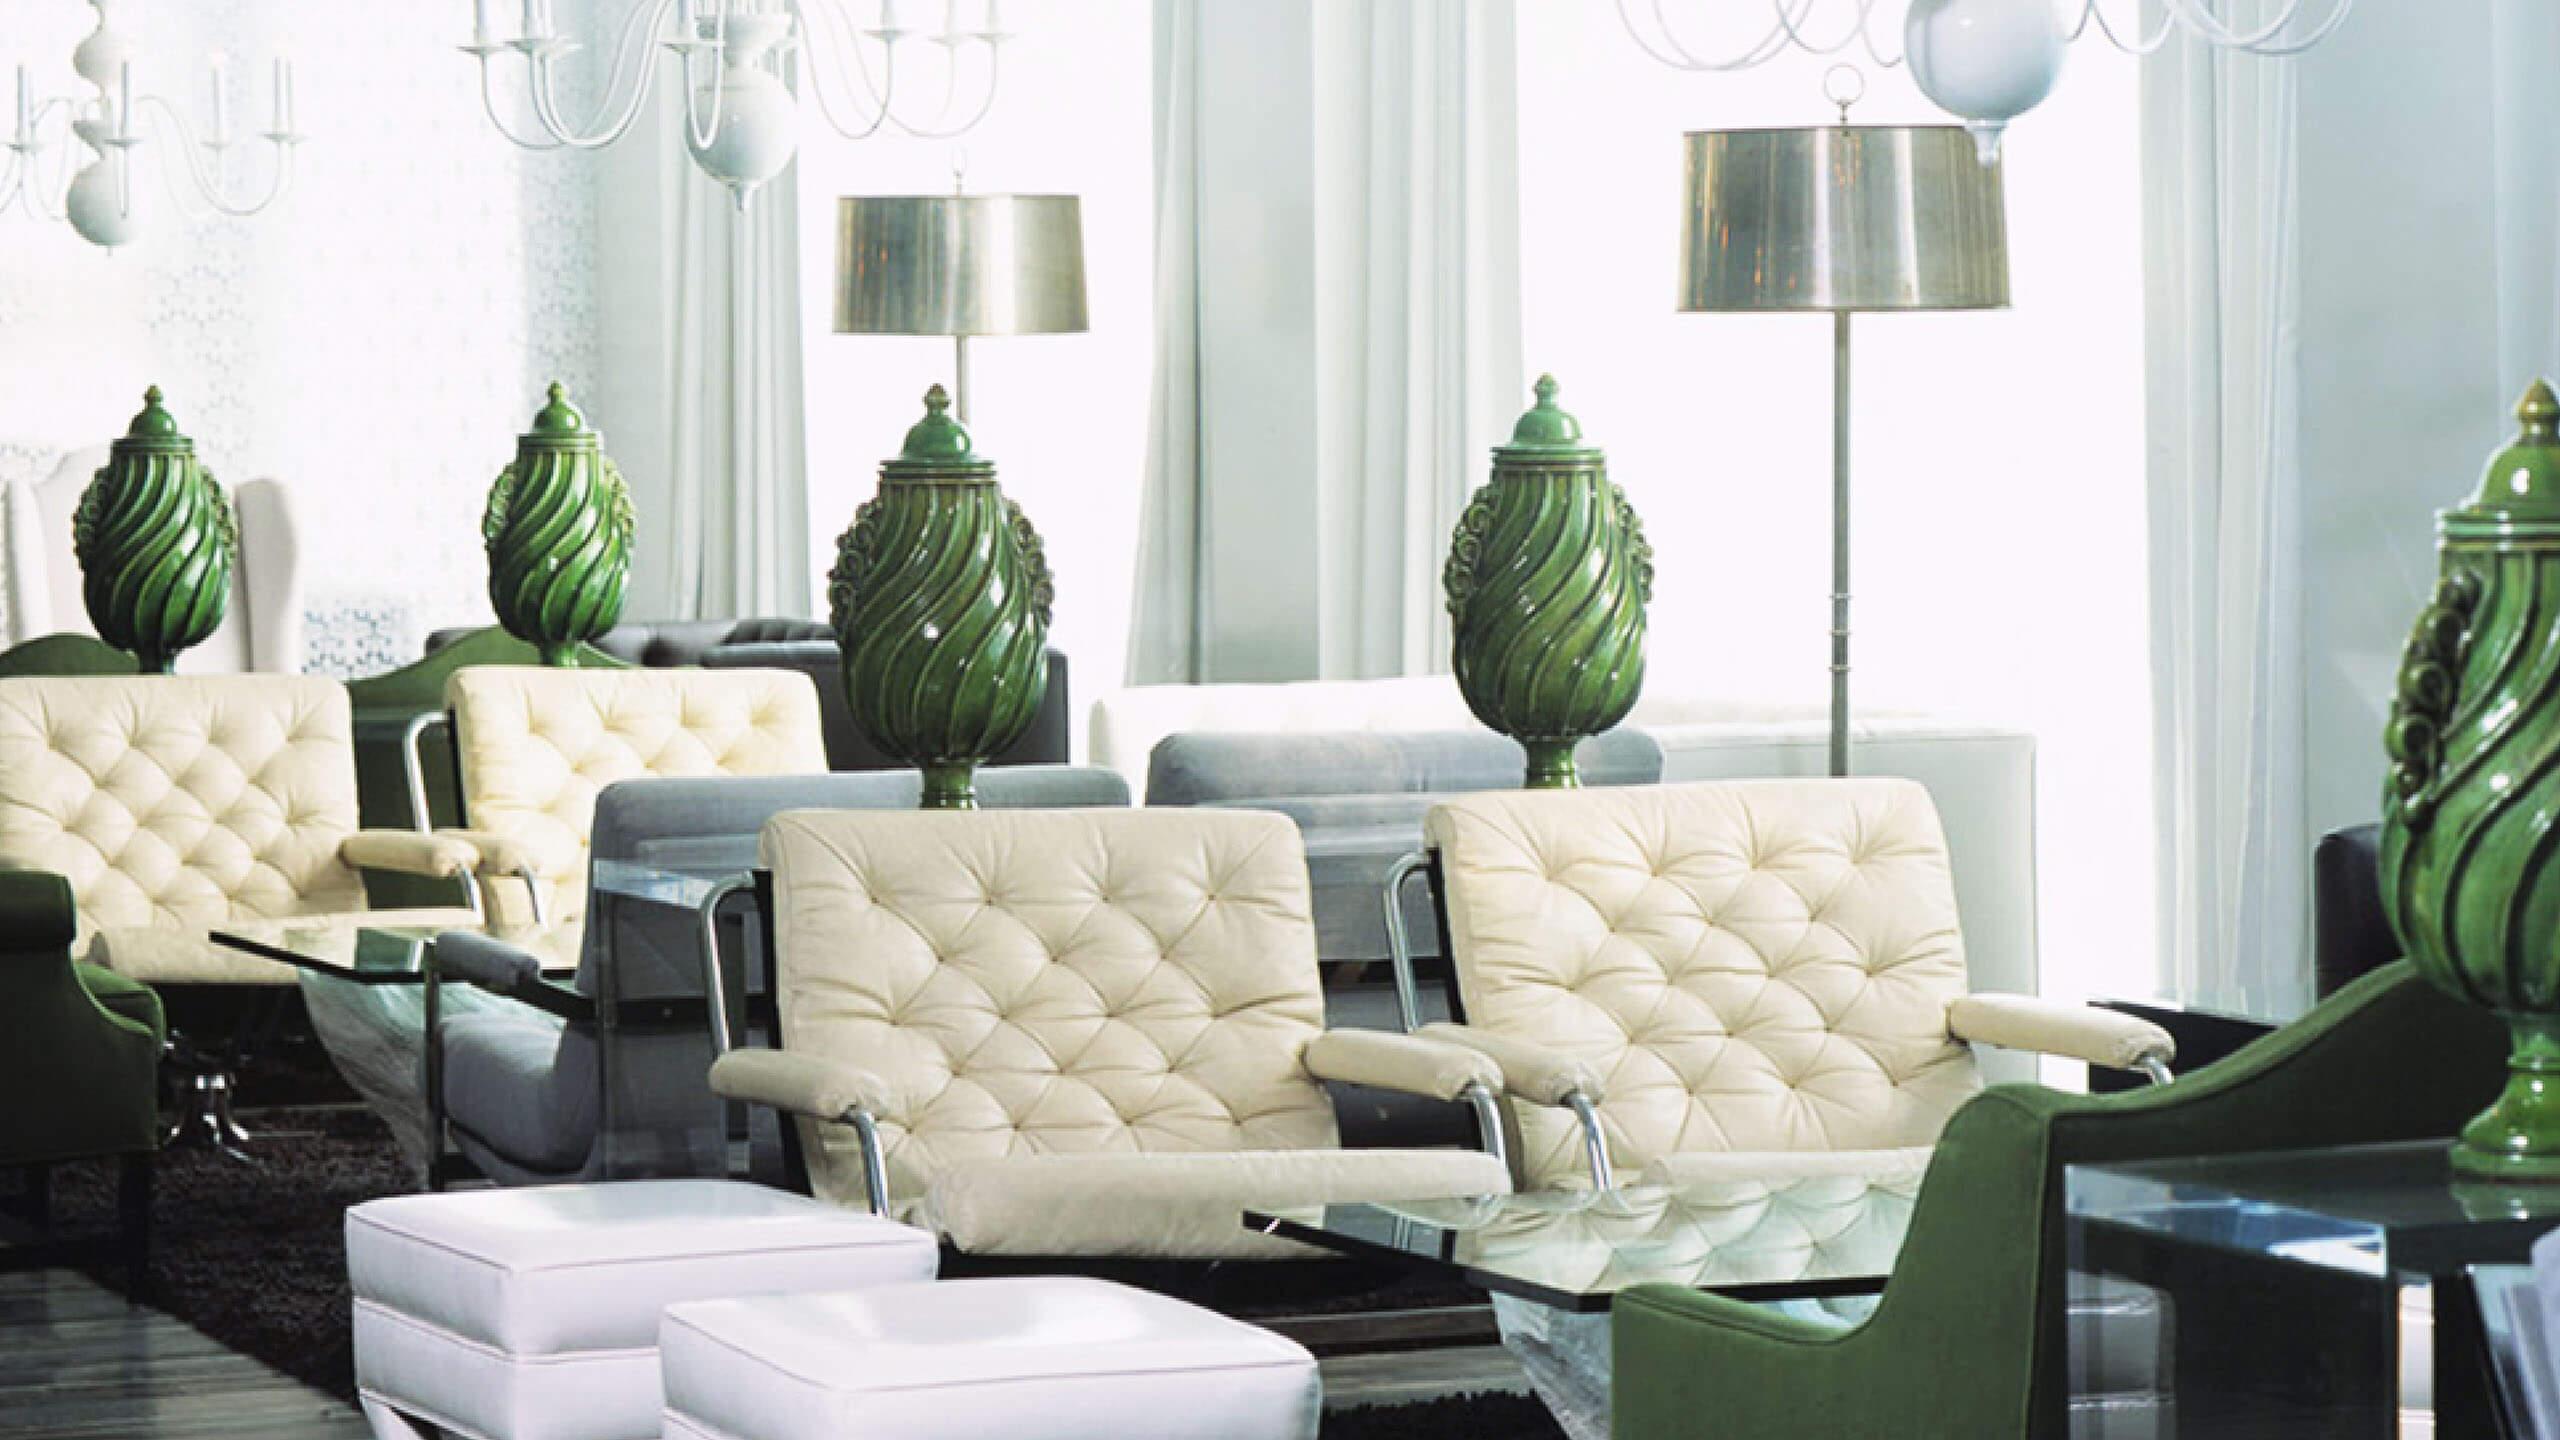 Kelly Wearstler Online Store Interiors